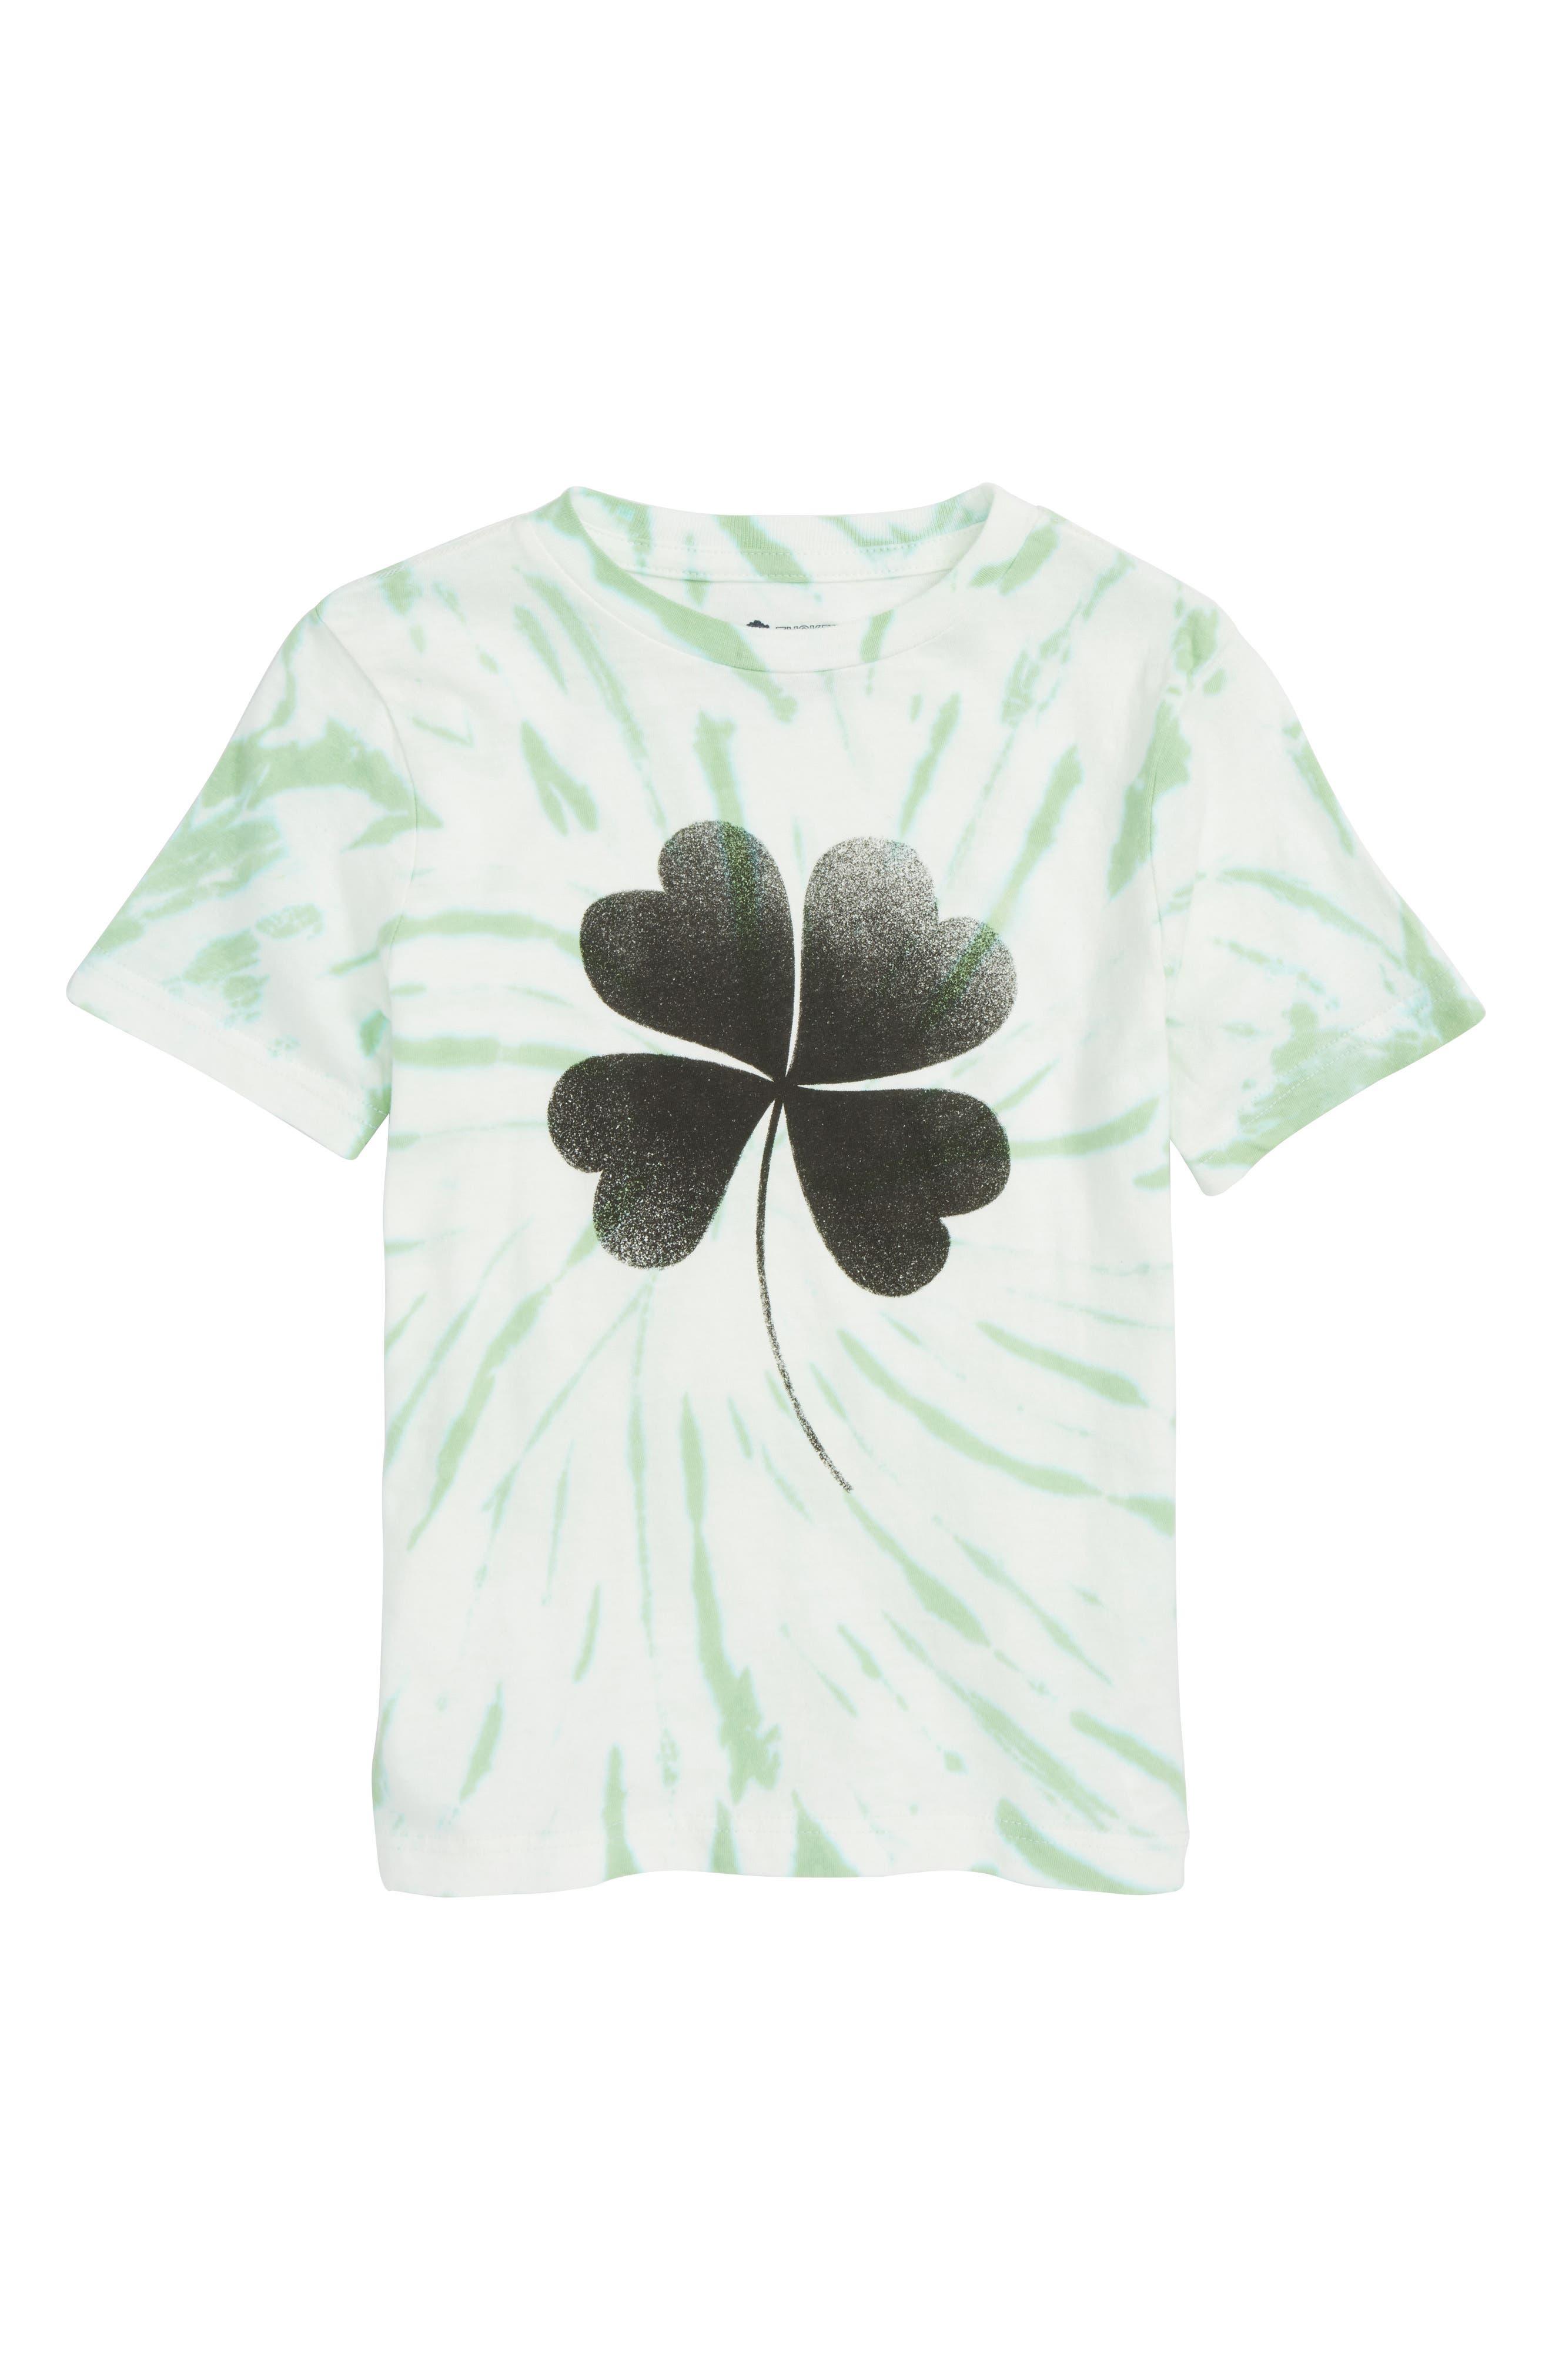 Alternate Image 1 Selected - Tucker + Tate Graphic T-Shirt (Toddler Boys, Little Boys & Big Boys)